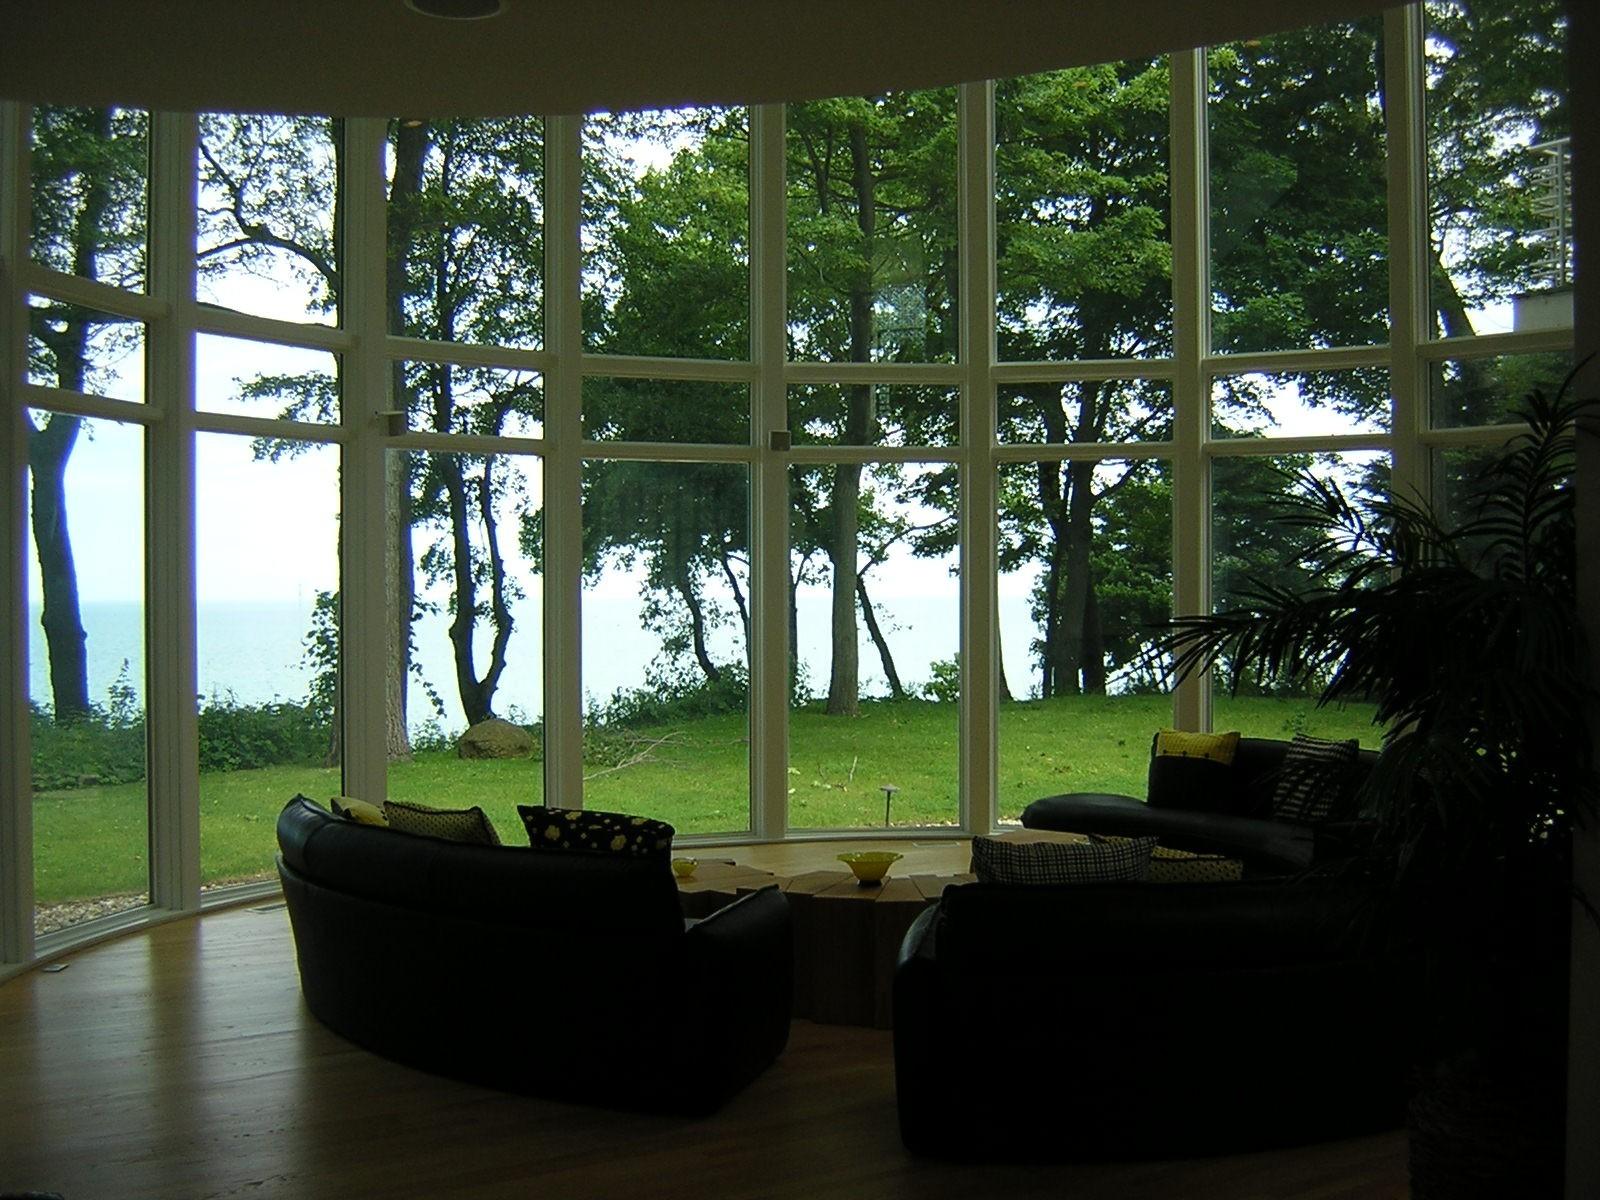 Real Estate Photography - 15930 Lake Ave, Union Pier, MI, 49129 - Location 4